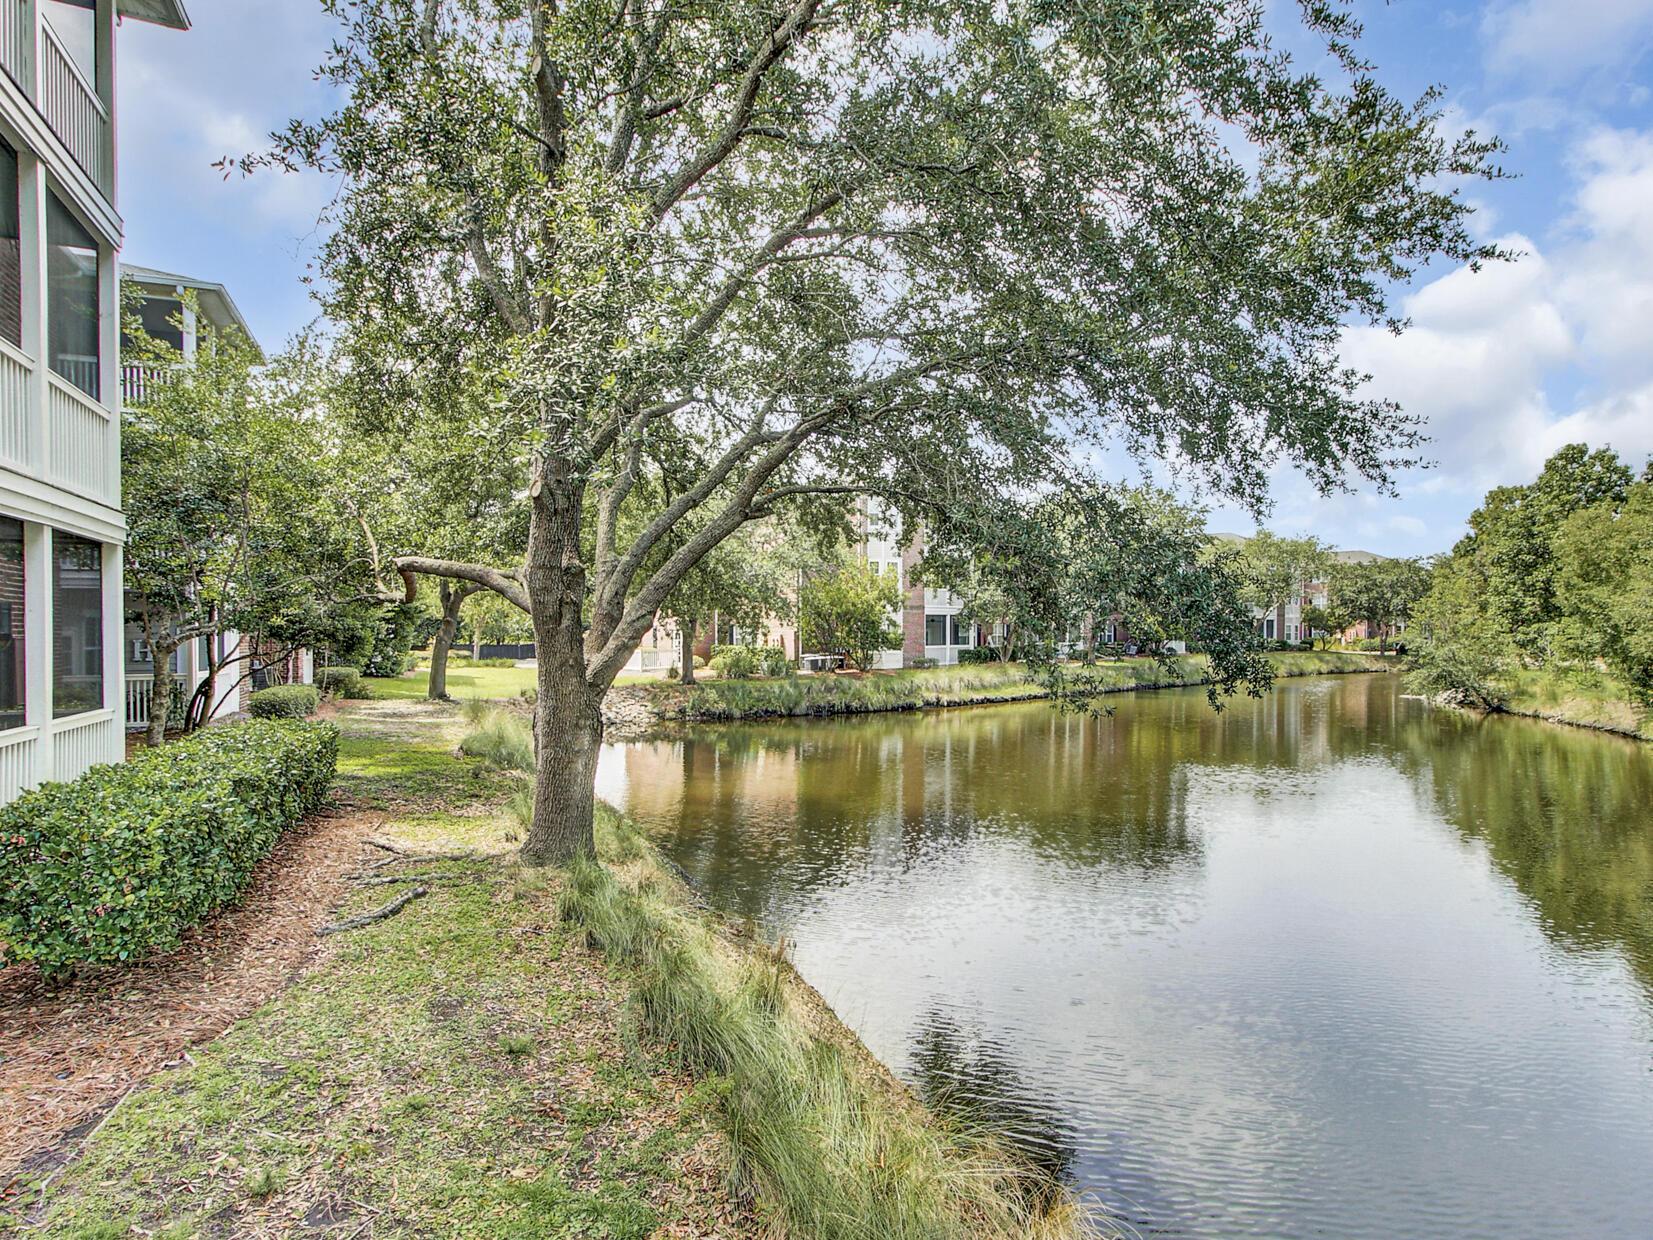 Cambridge Lakes Homes For Sale - 1485 Cambridge Lakes, Mount Pleasant, SC - 14